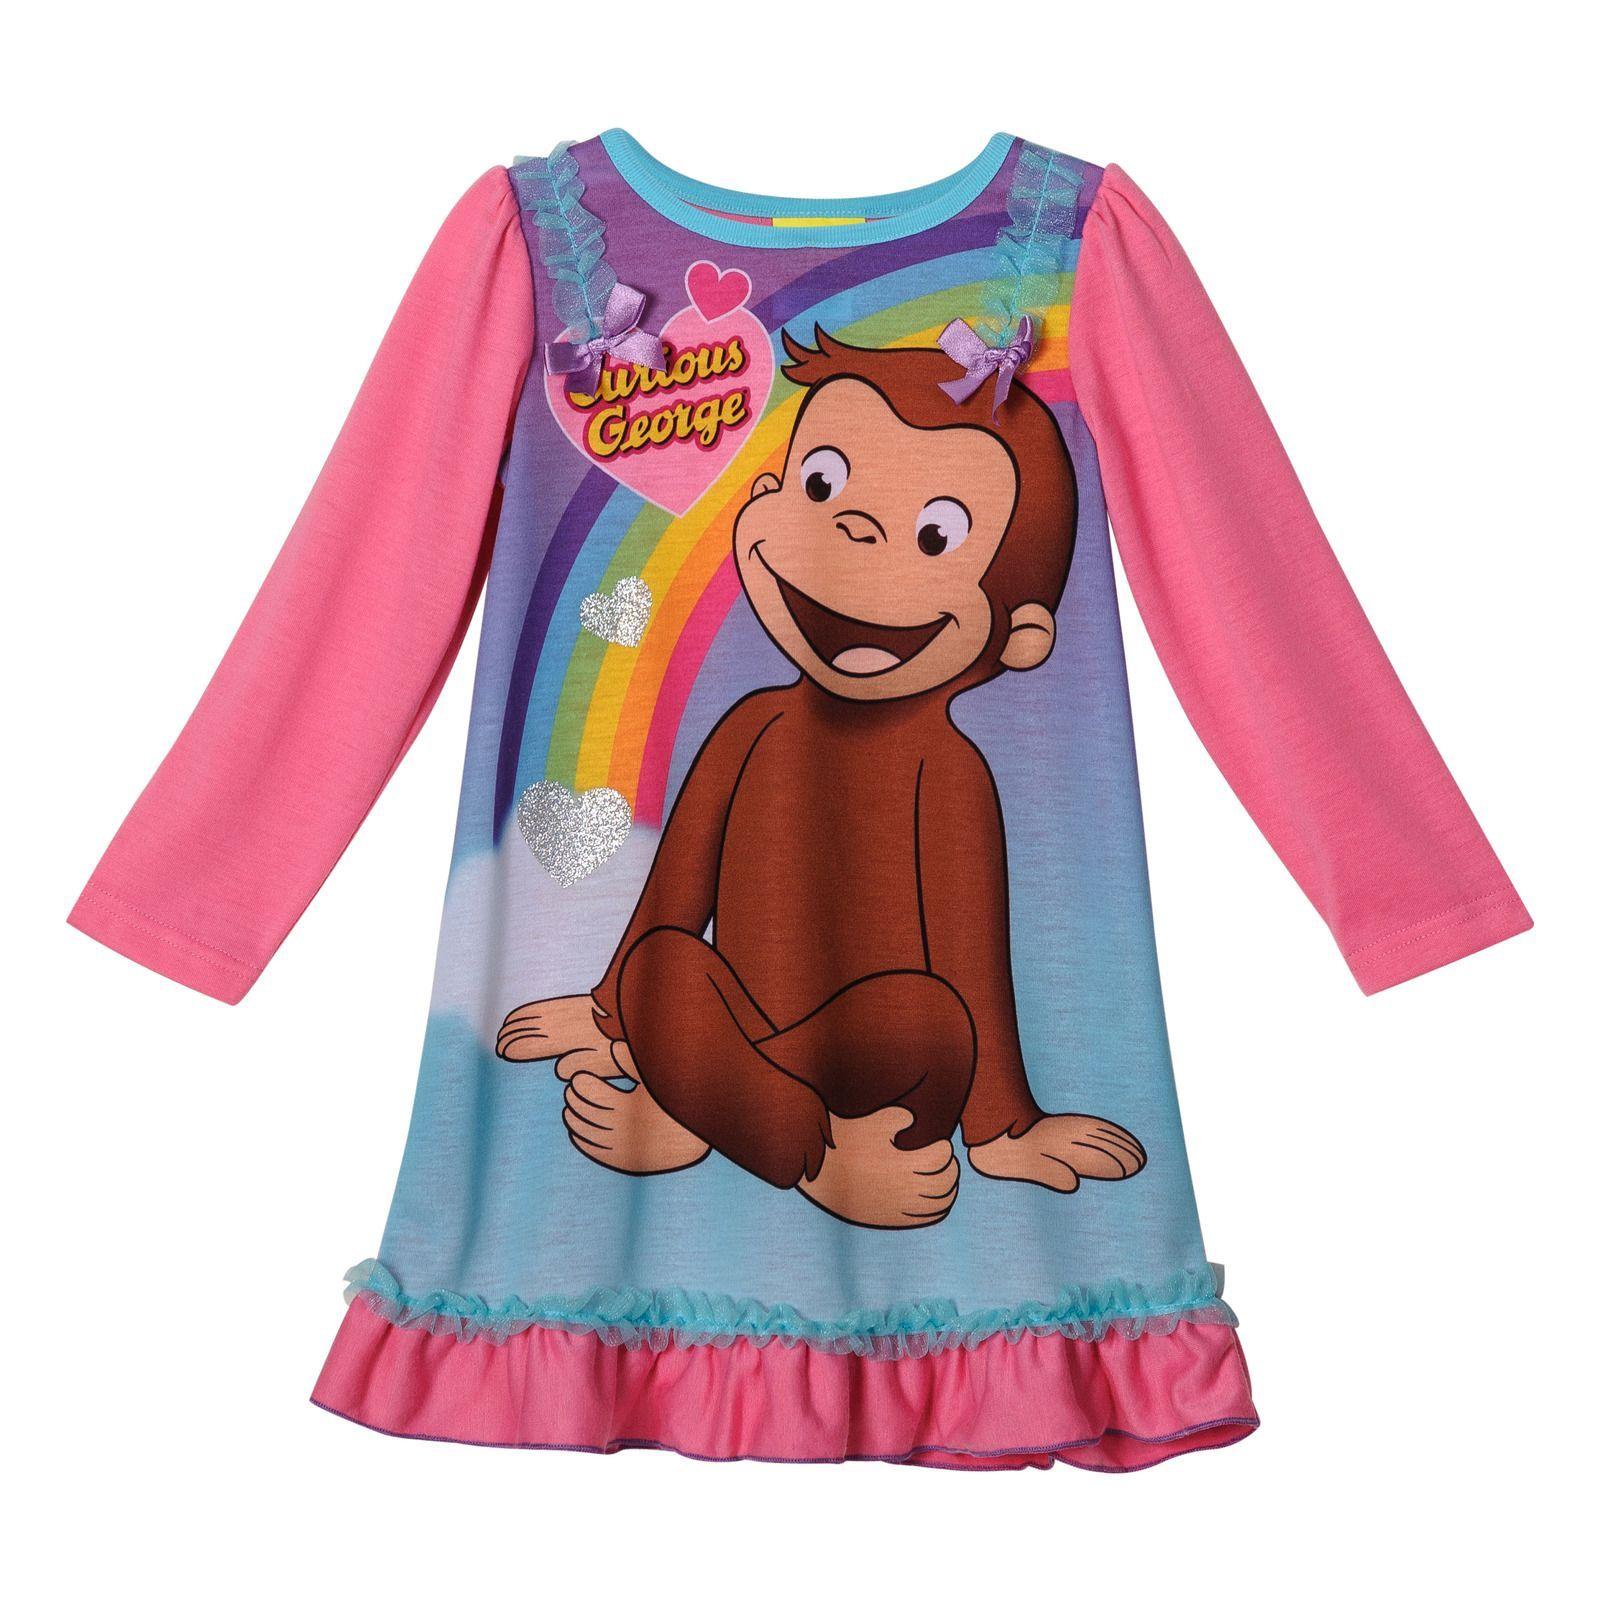 Curious George Girls Long Sleeve Nightgown Pajamas Toddler Girls Nightgown Girls Long Sleeve Toddler Pajamas